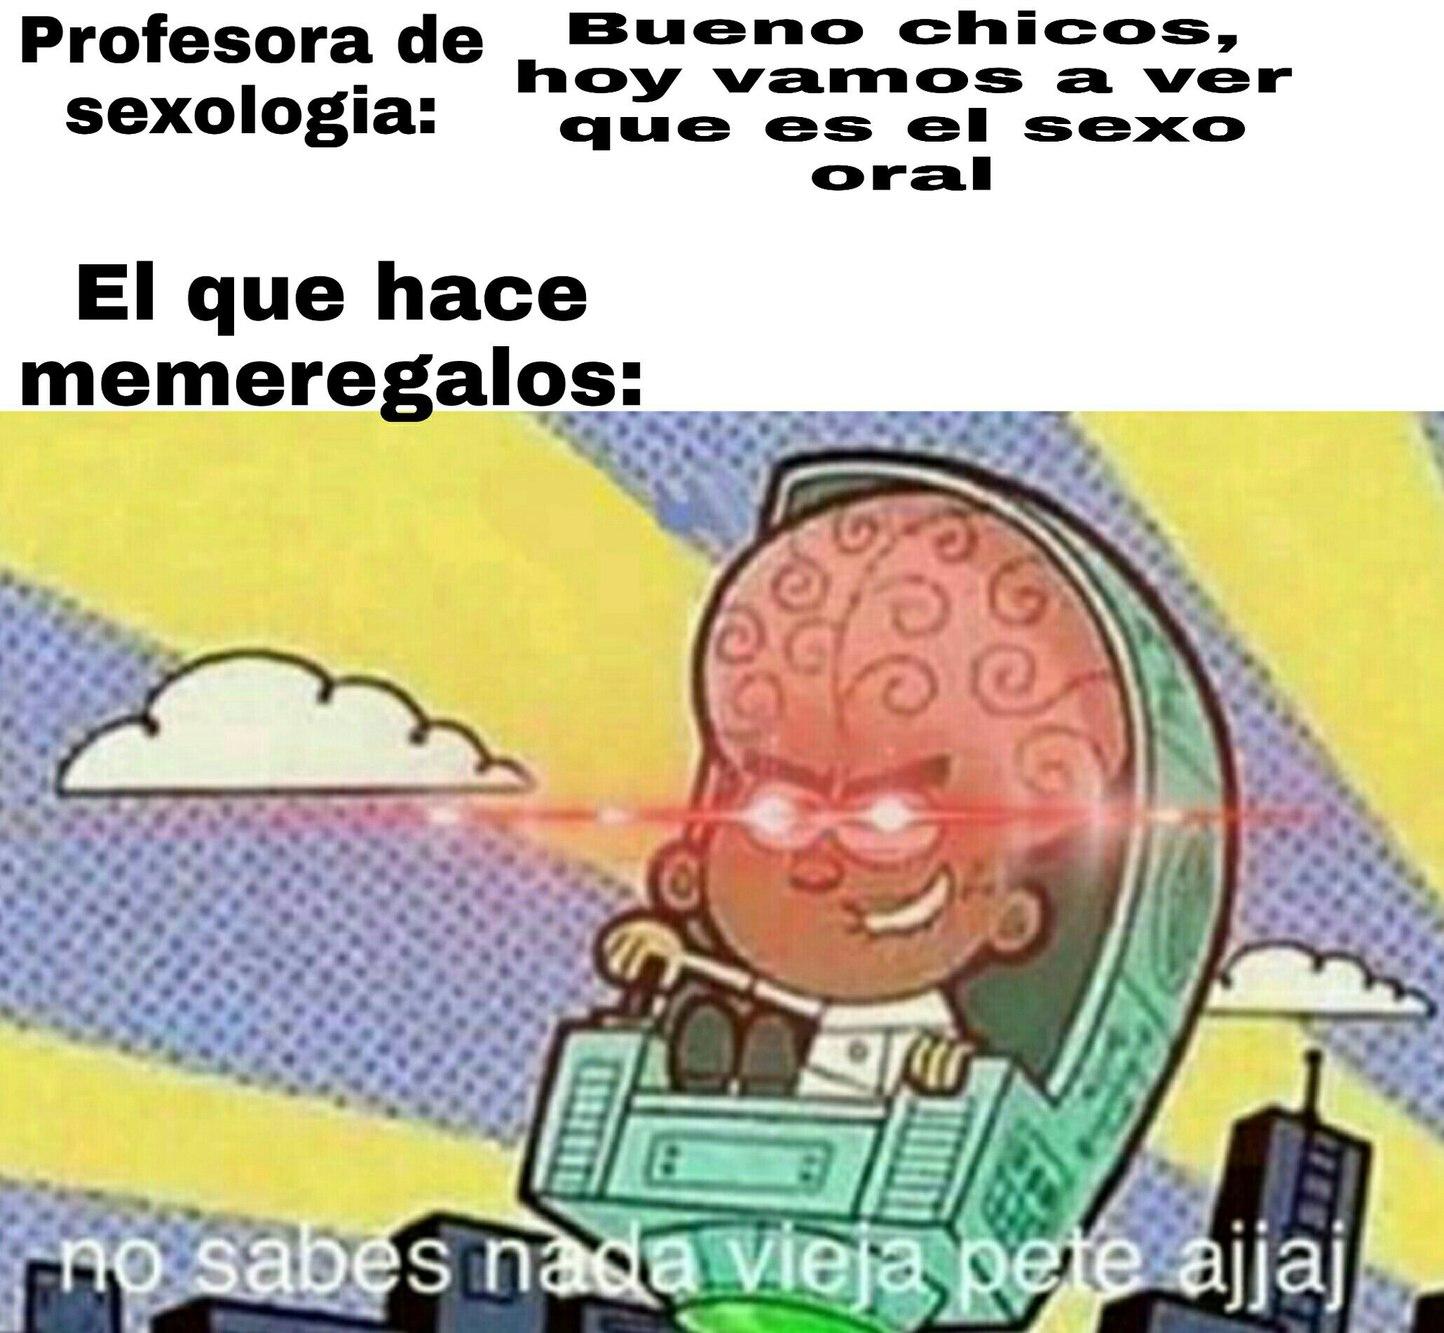 Dea - meme